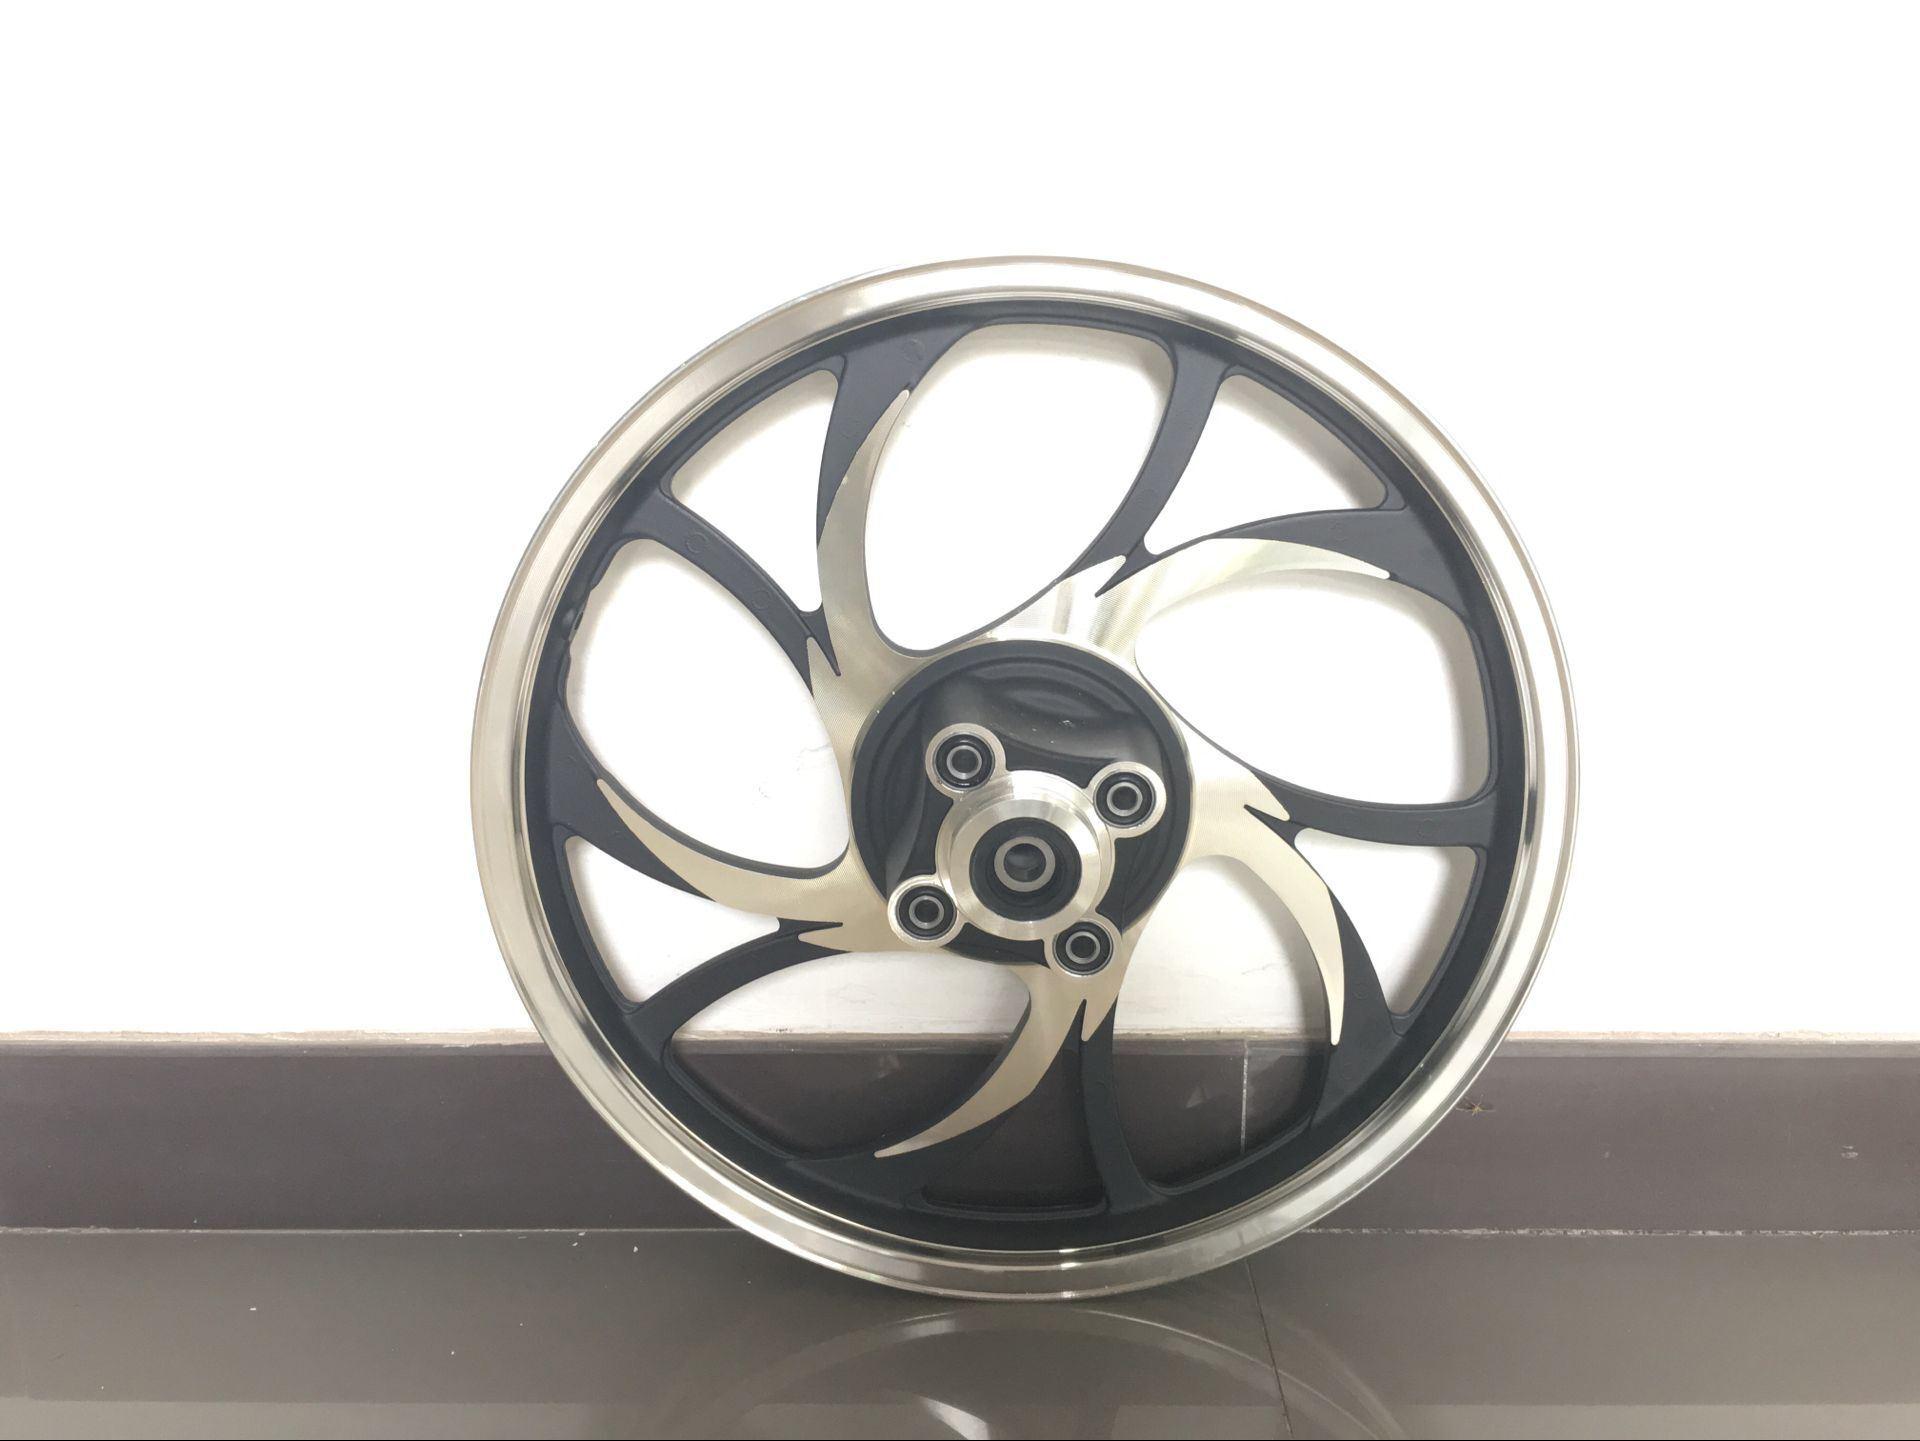 Cg125, Motorcycle Alloy Wheel Hub, Rim